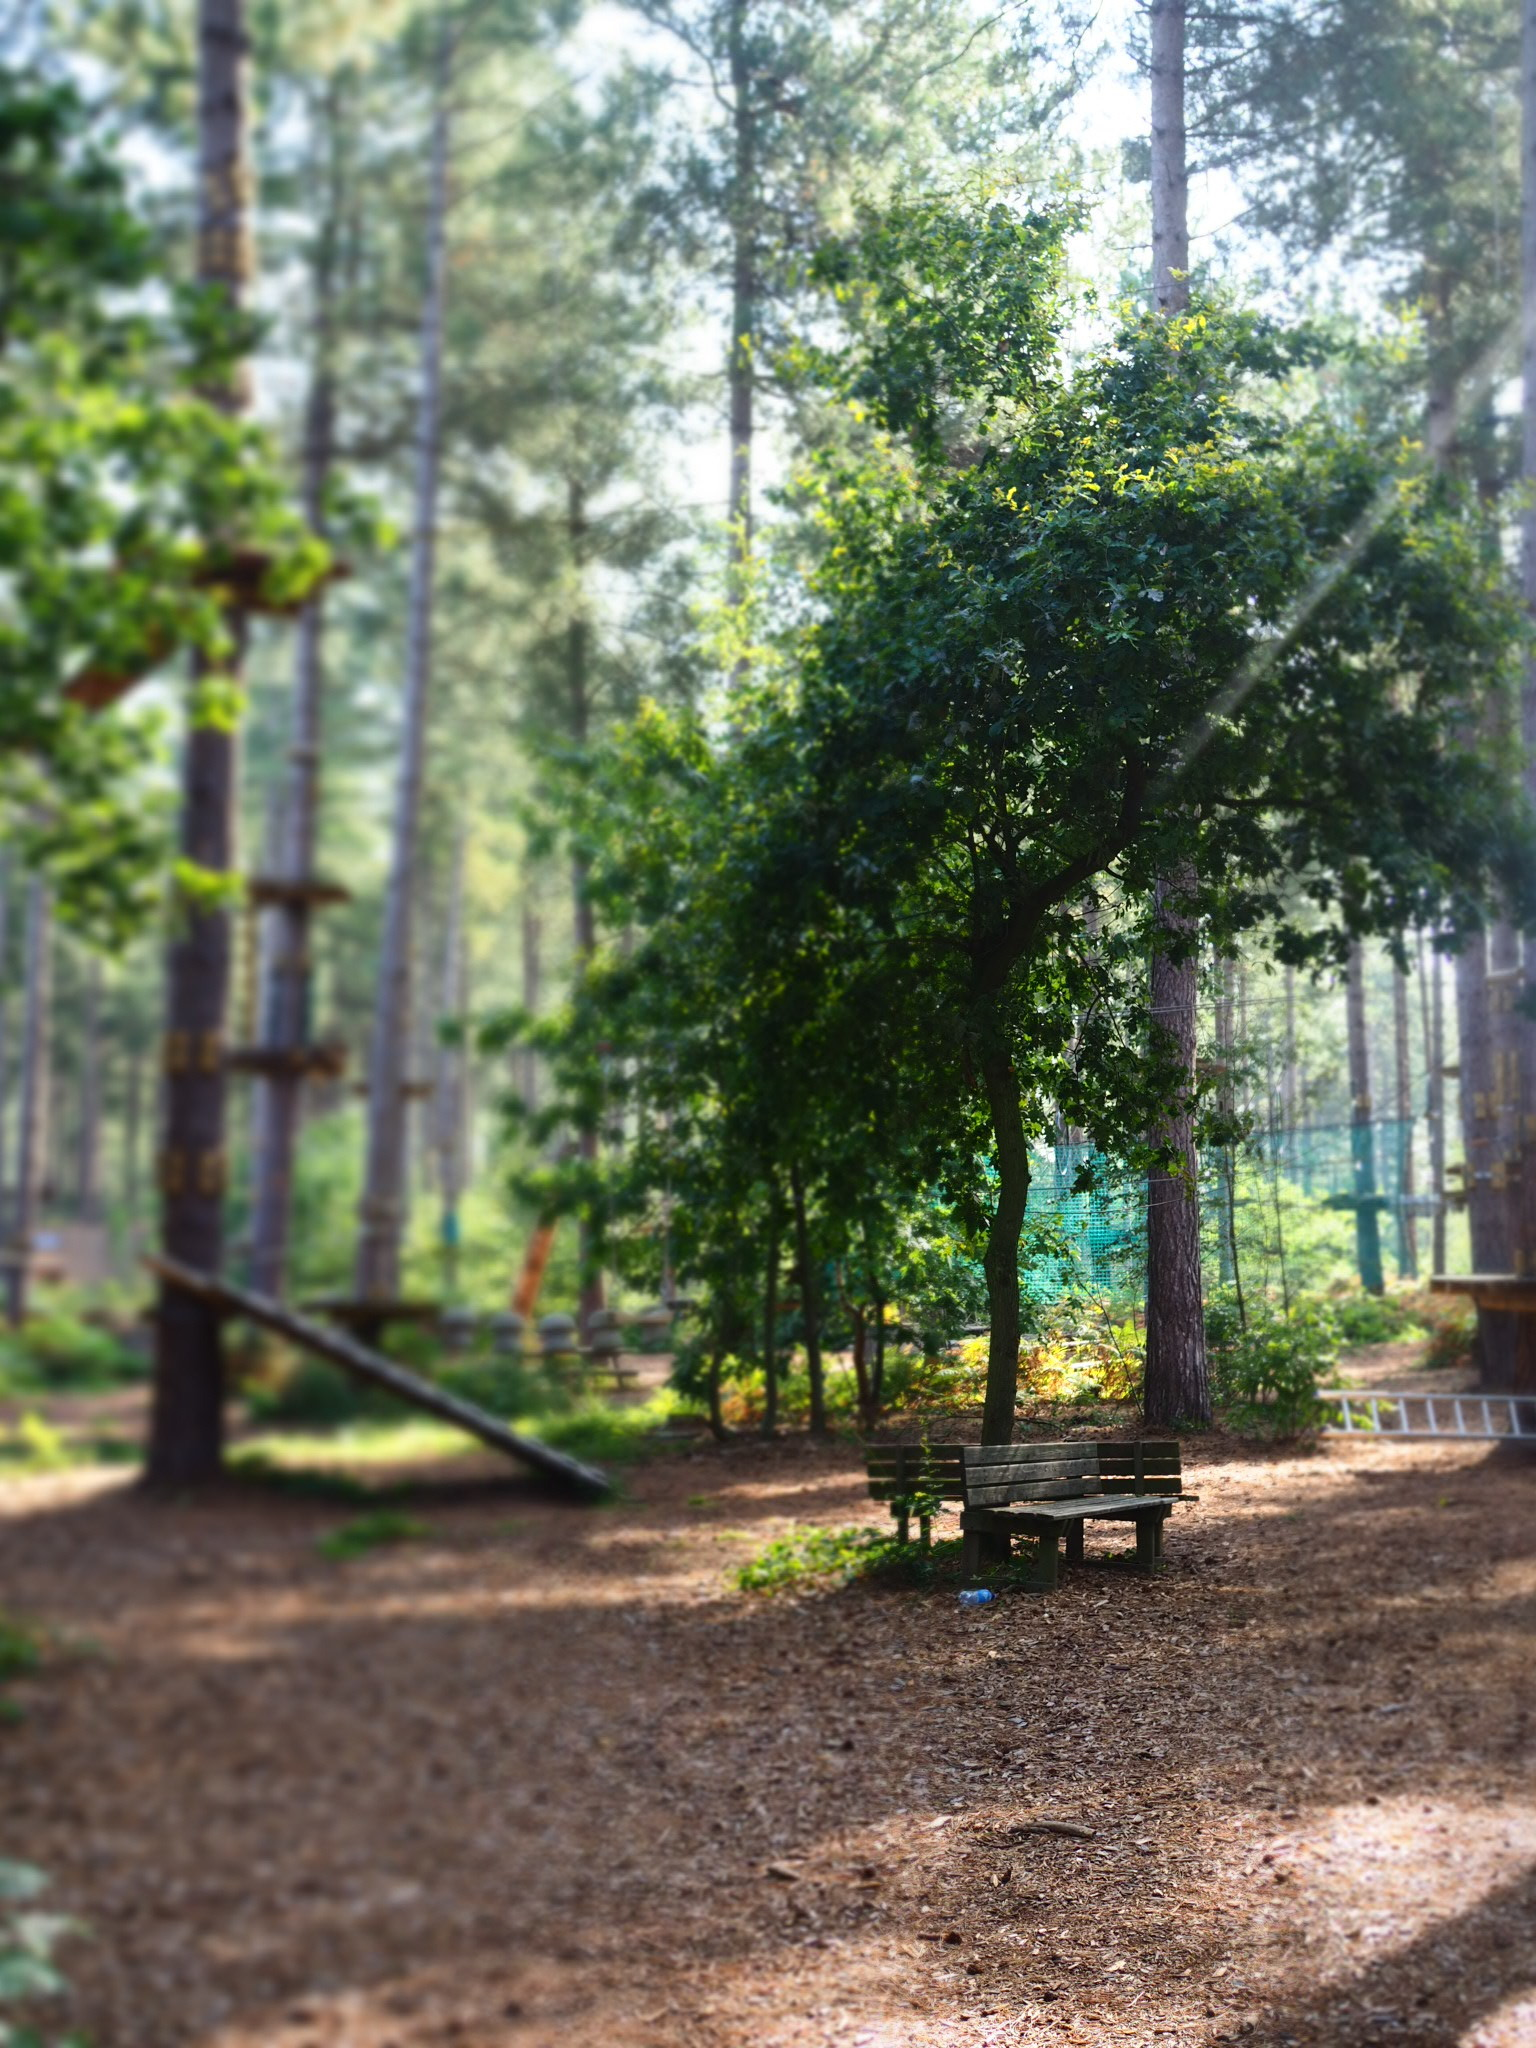 The Go Ape style adventure park